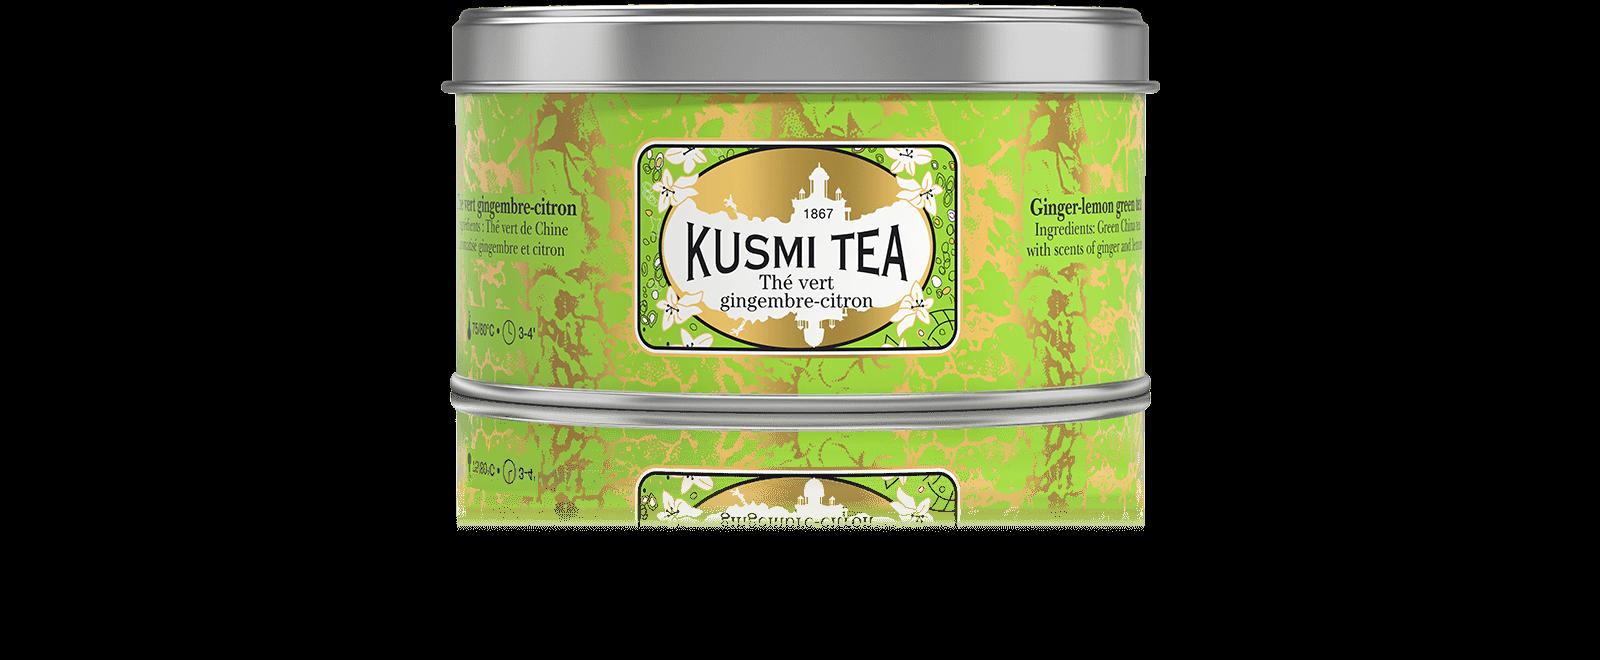 Thé vert saveur gingembre-citron - Thé vert, gingembre, citron - Kusmi Tea